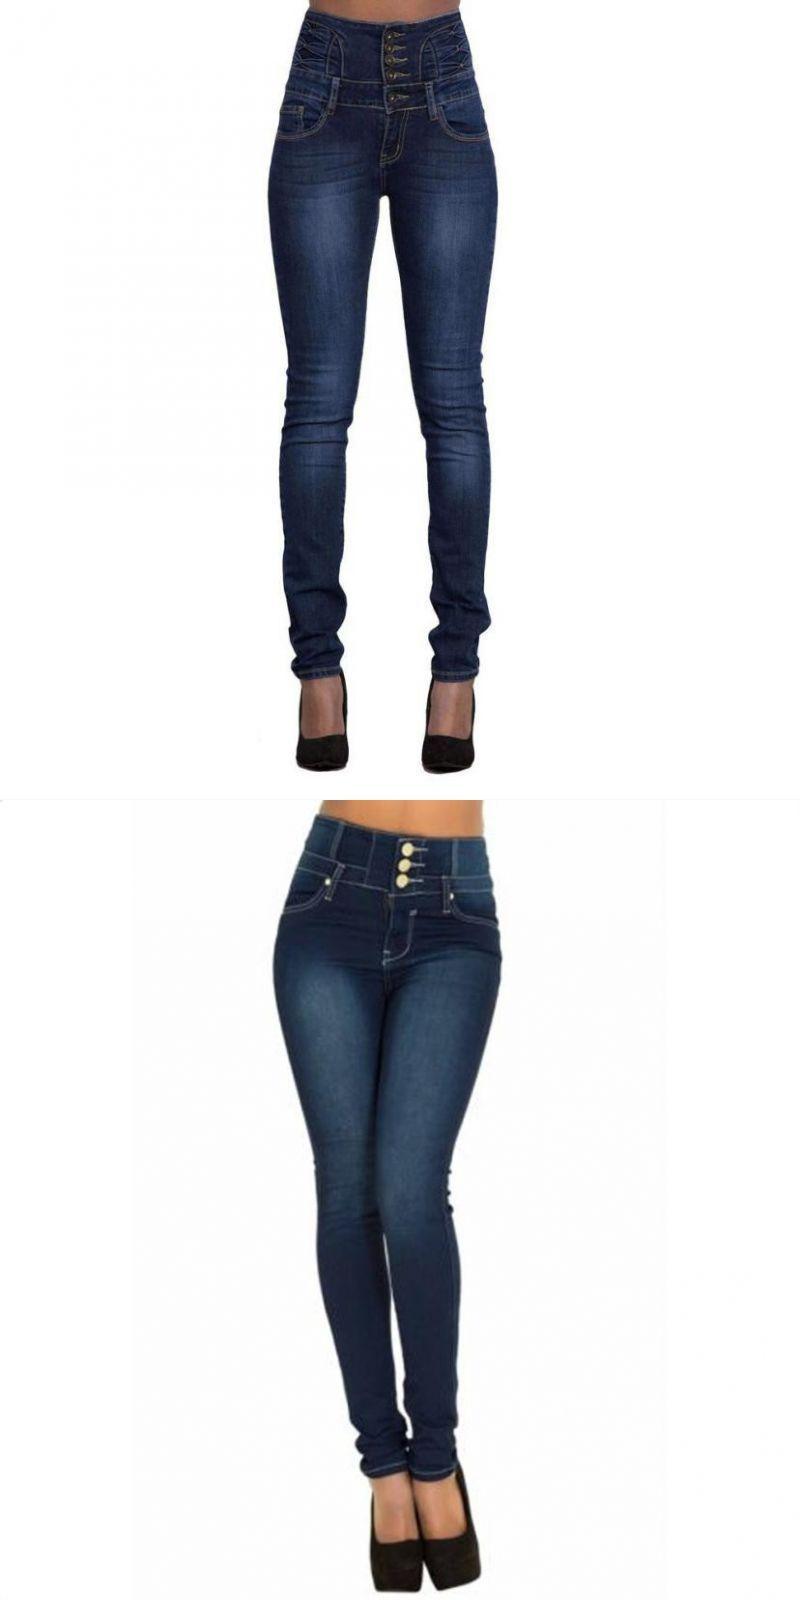 c7346bda3cb8f New coming lovely women ripped high waist slim skinny jeans stretch denim  hot pencil denim pants jeans mujer pantalon femme  cotton  full  length   light ...